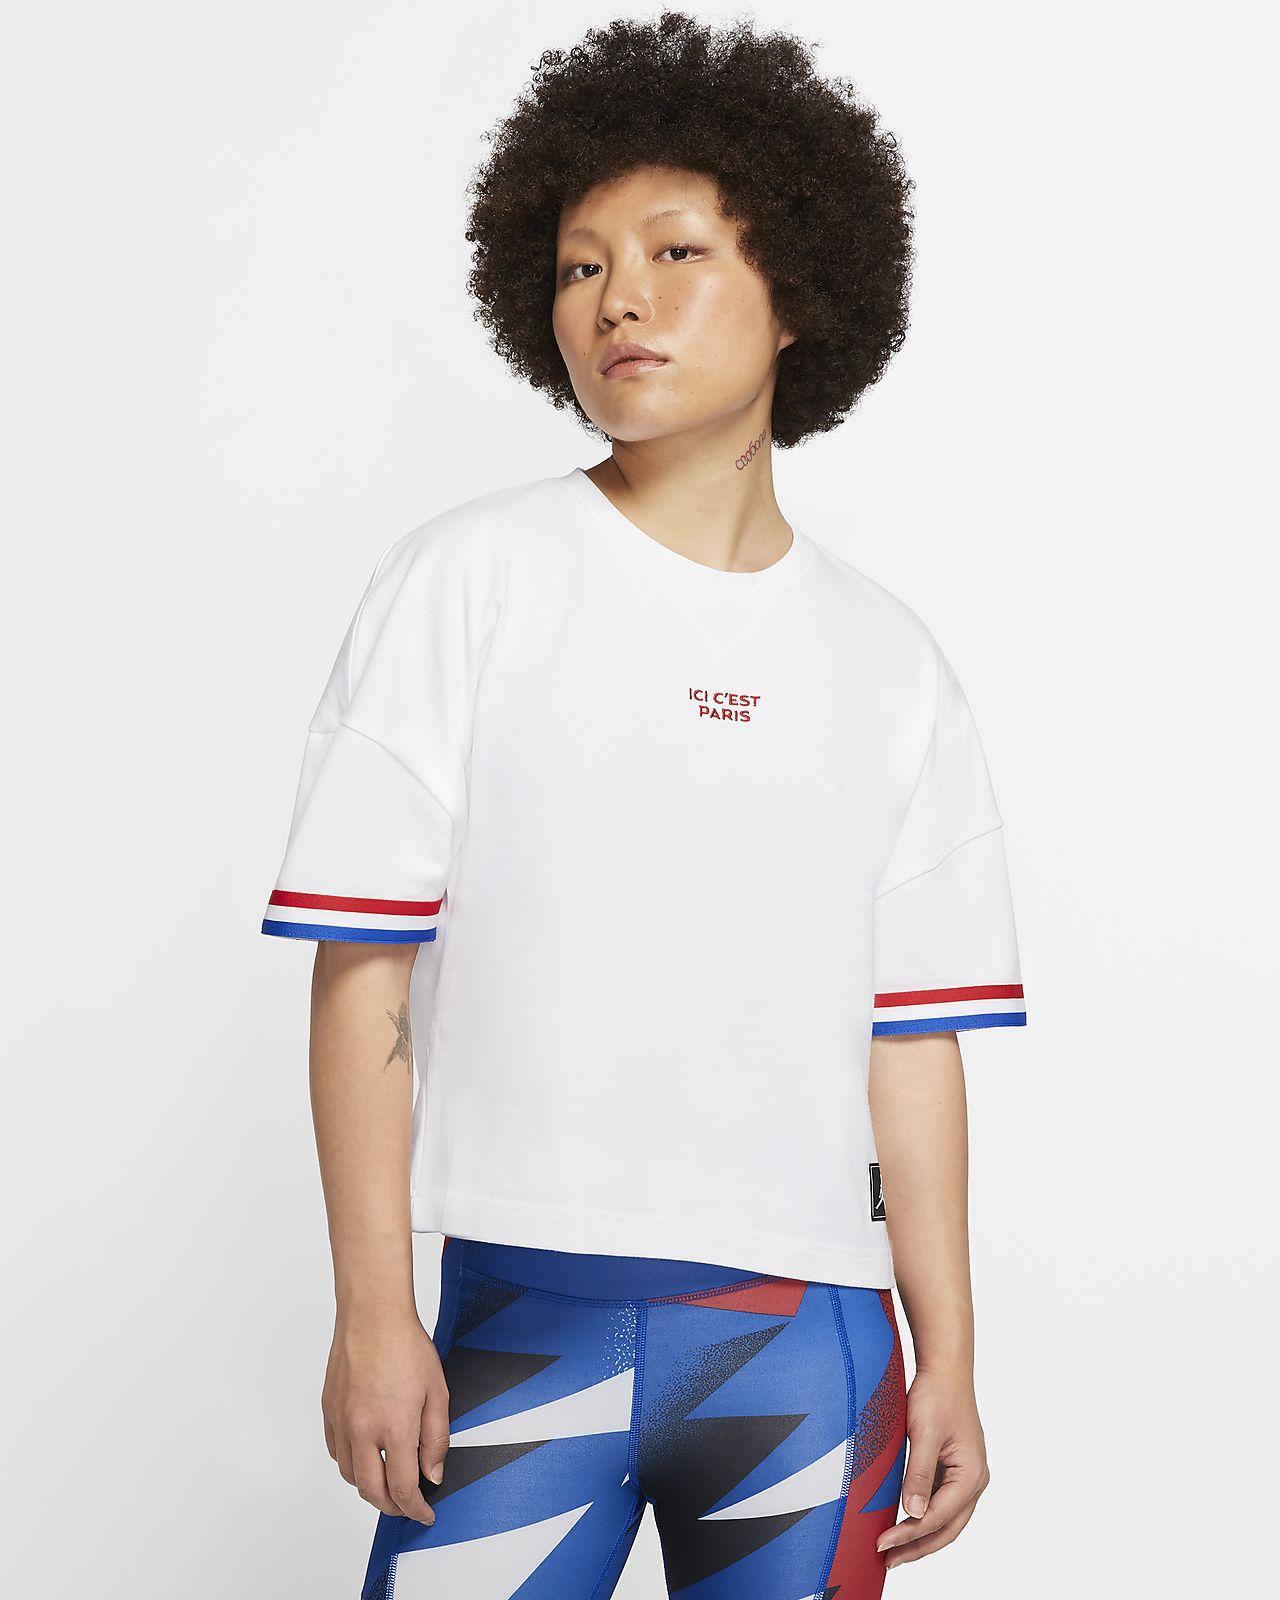 Paris Saint-Germain Women's Short-Sleeve Top